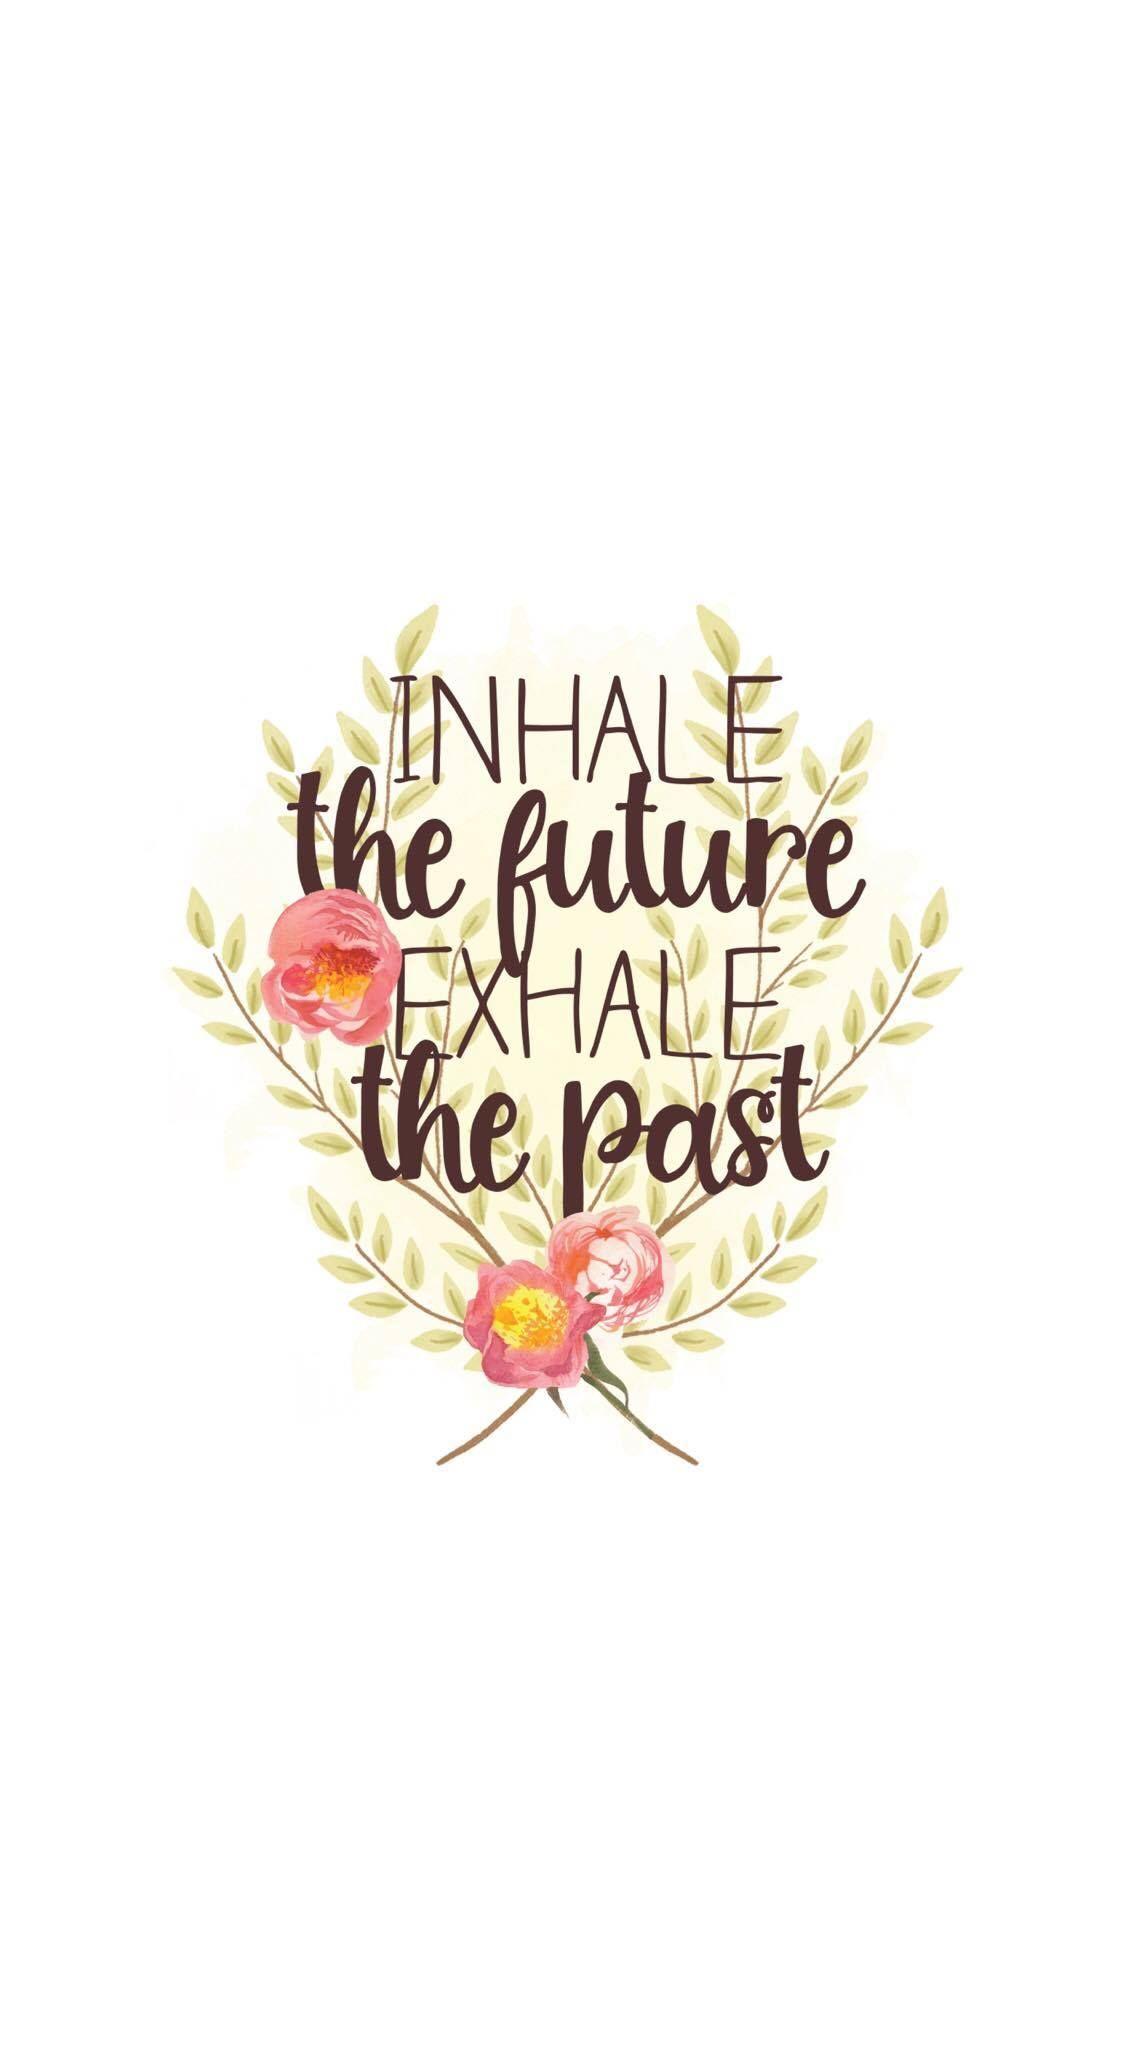 Wallpaper, Phone, Hintergrund, Hintergründe, Handy Hintergrund, Handy Wallpaper, iPhone Wallpaper, Android, zitate, zitat, quote, inhale the future and exhale the past #positivequotes